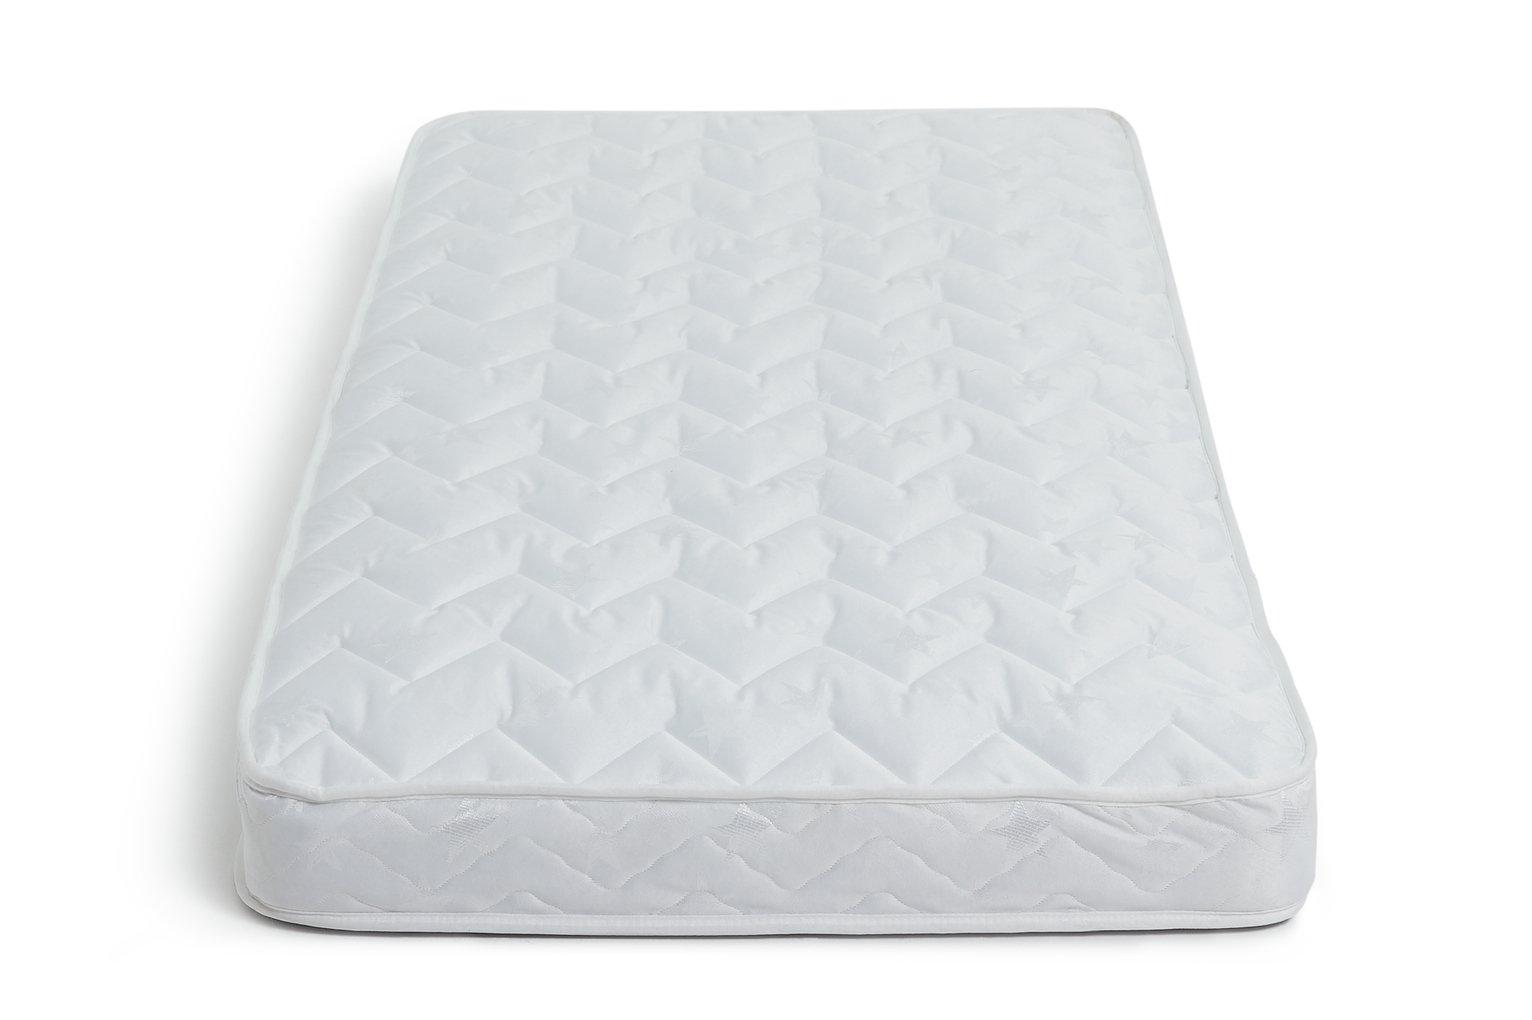 Image of Airsprung - New Elliott Comfort - Single Shallow Mattress-White